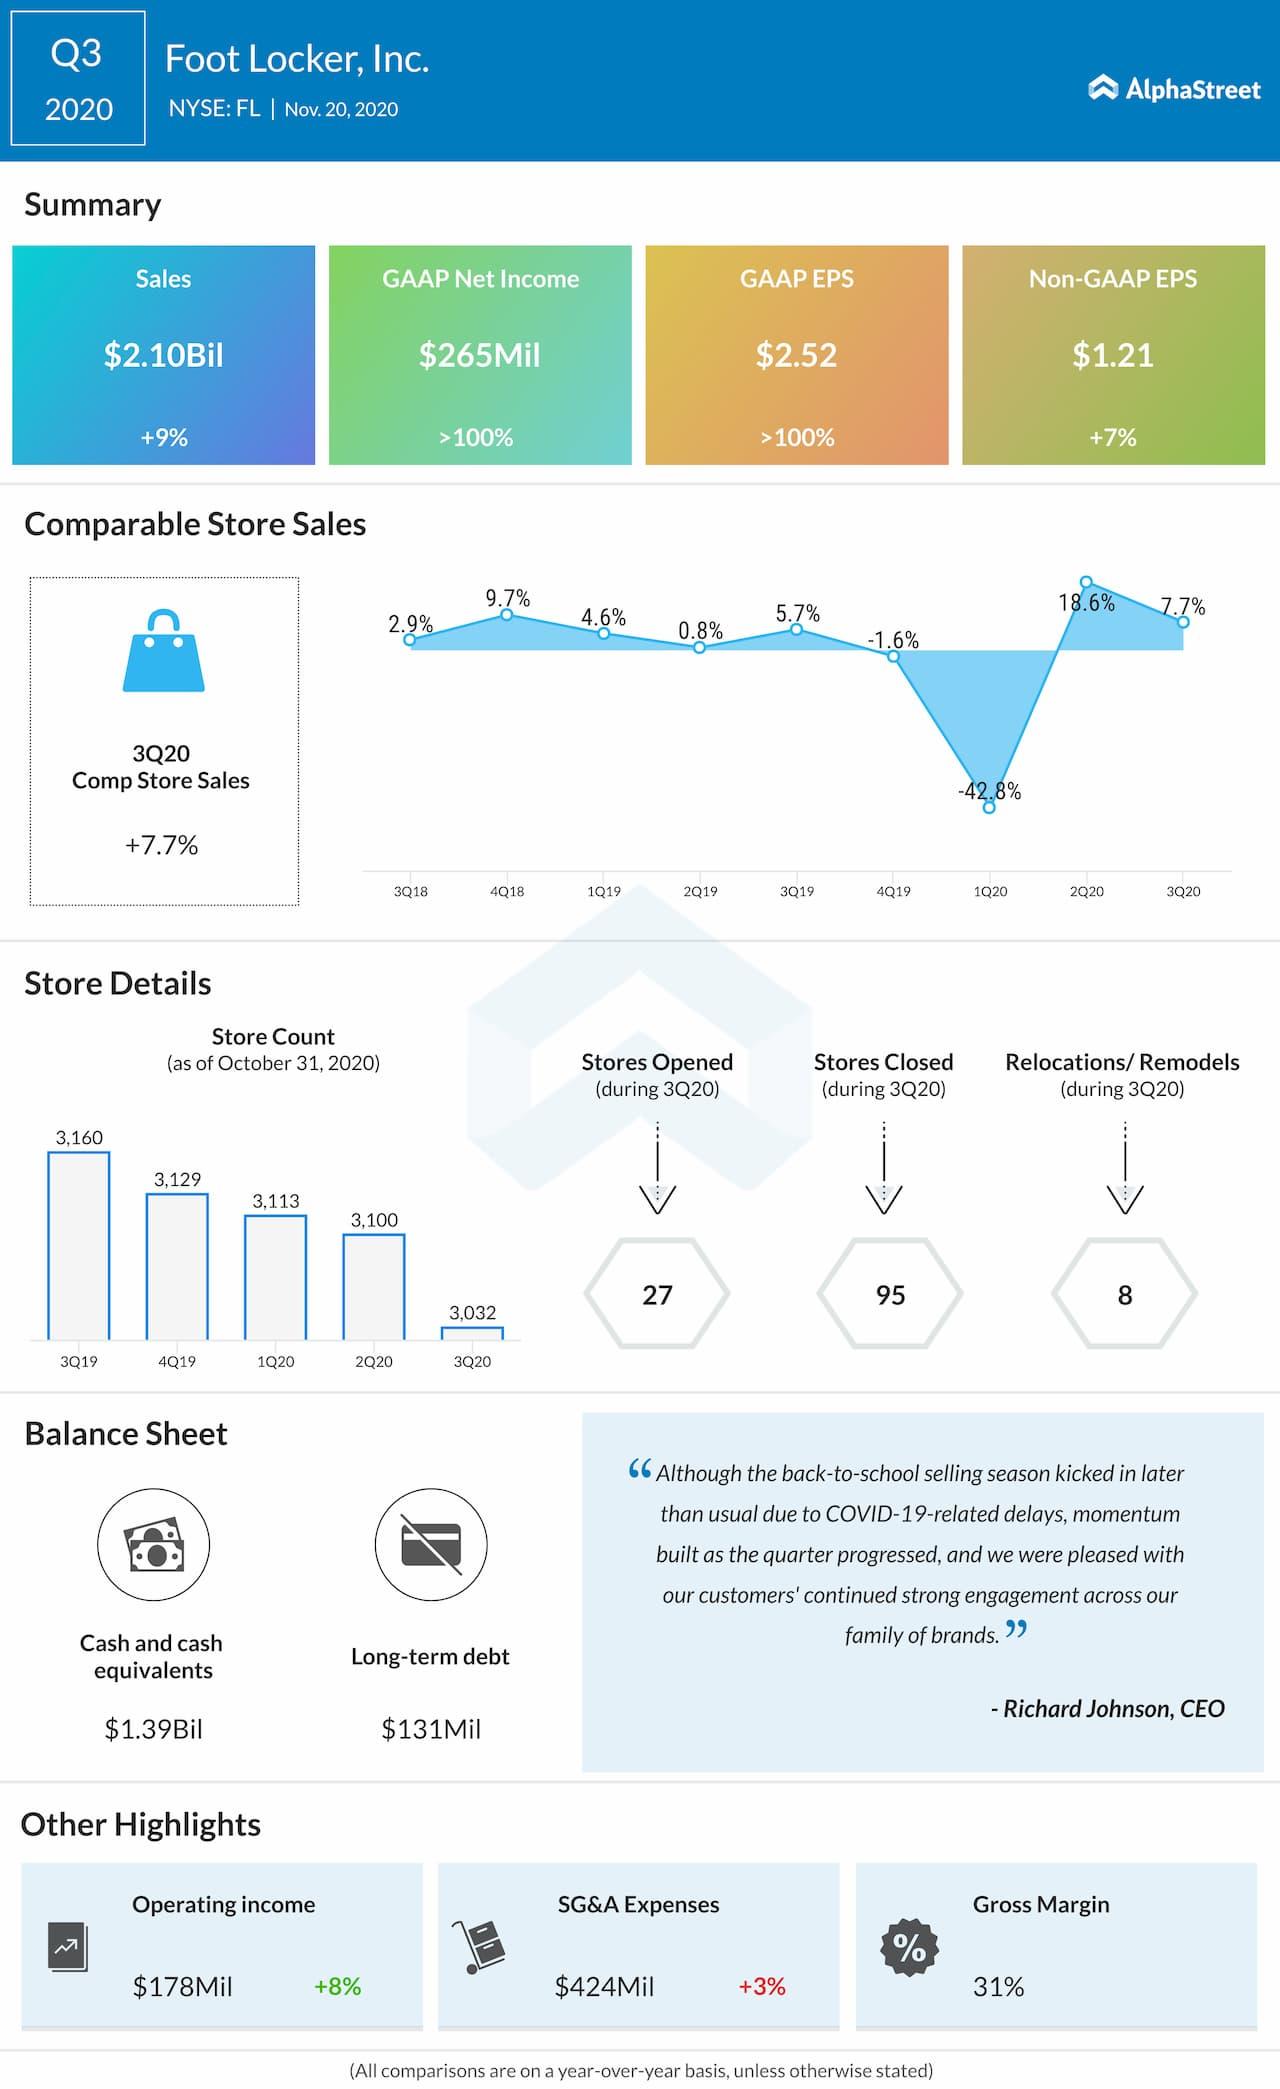 Foot Locker Q3 2020 Earnings Infographic